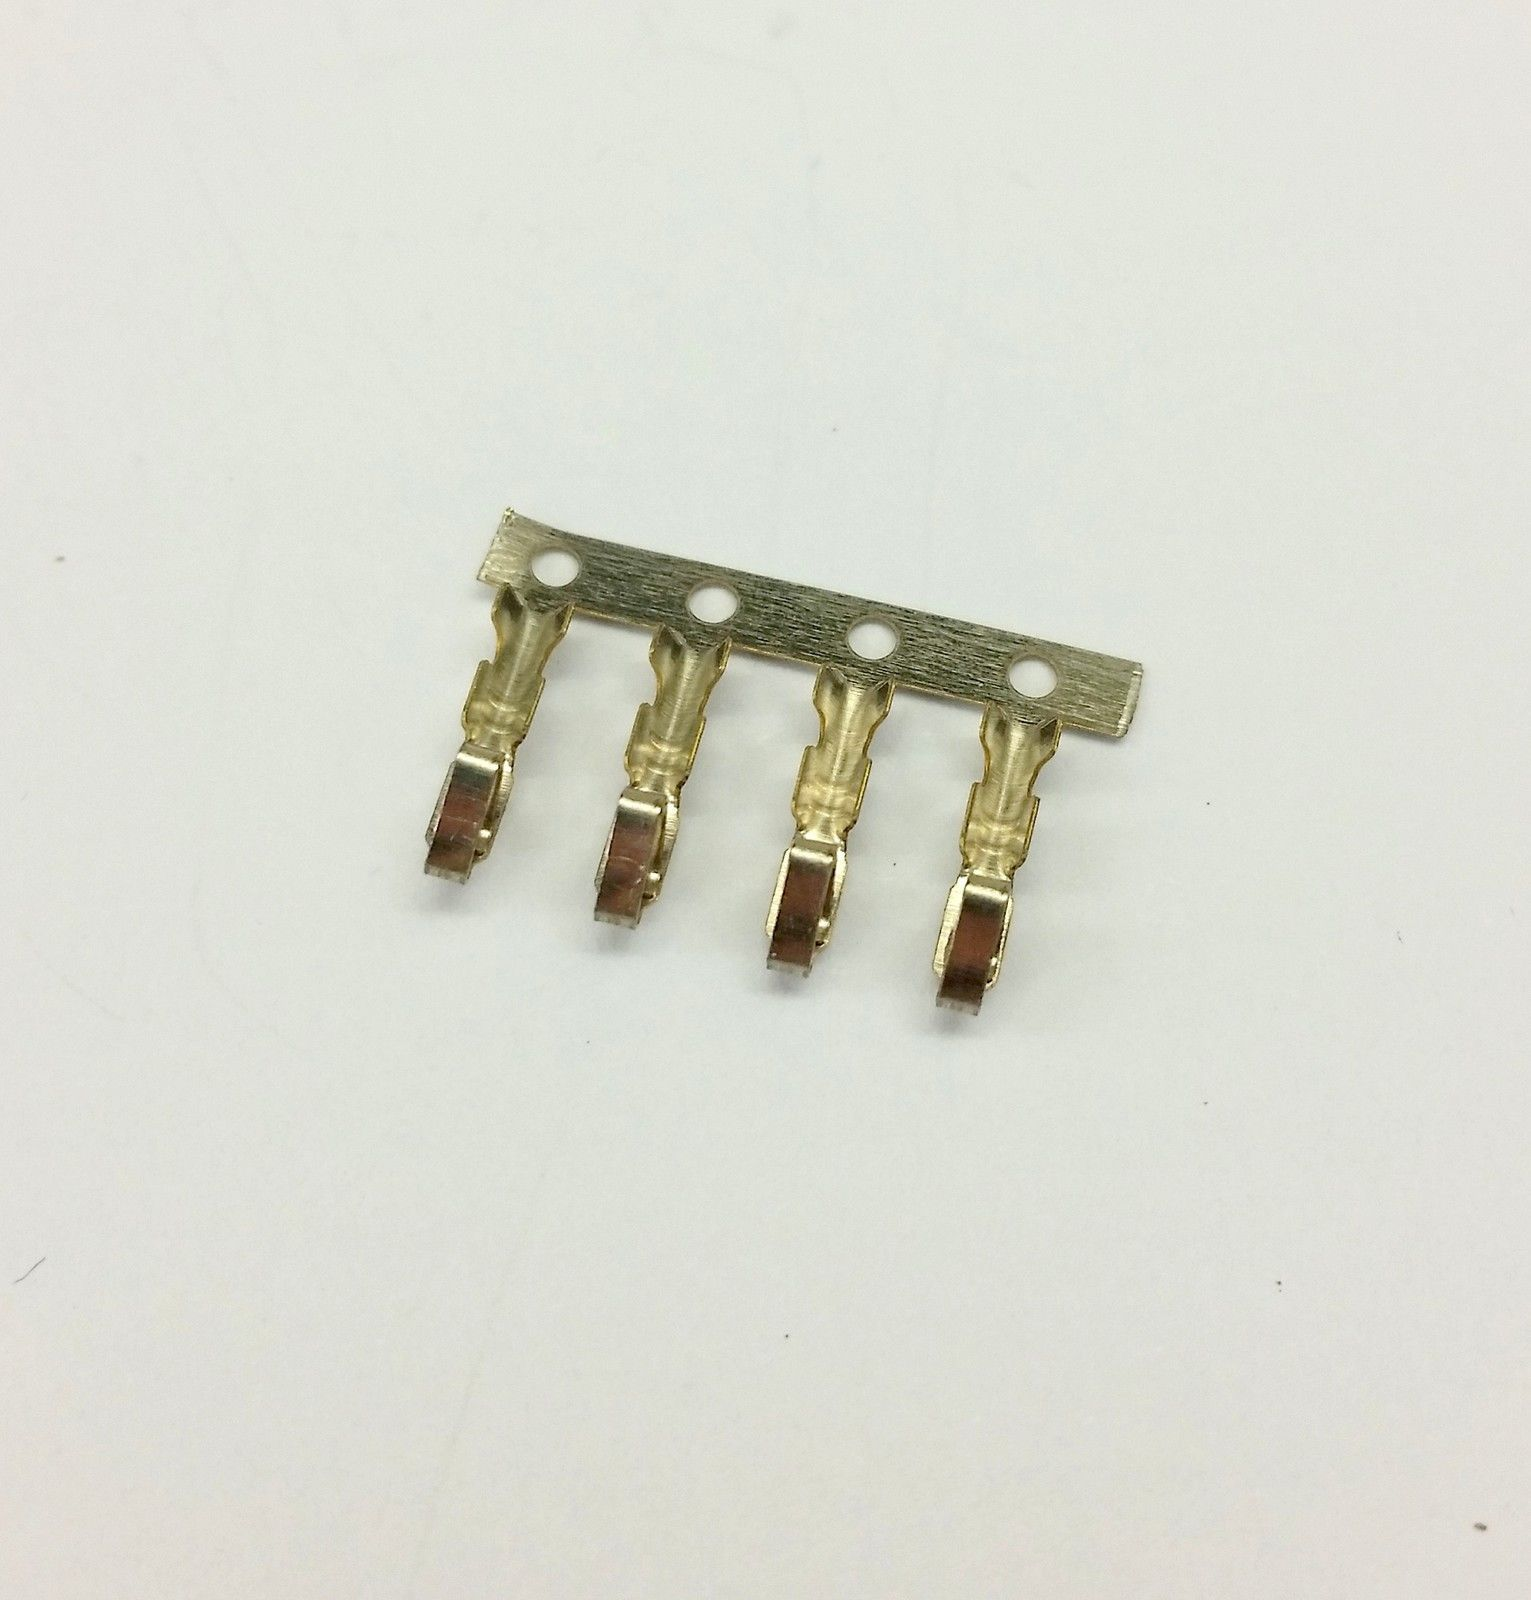 10er Packung - Buchse 4-polig Lüfter Stromanschluss - rot inklusive Pins image 5